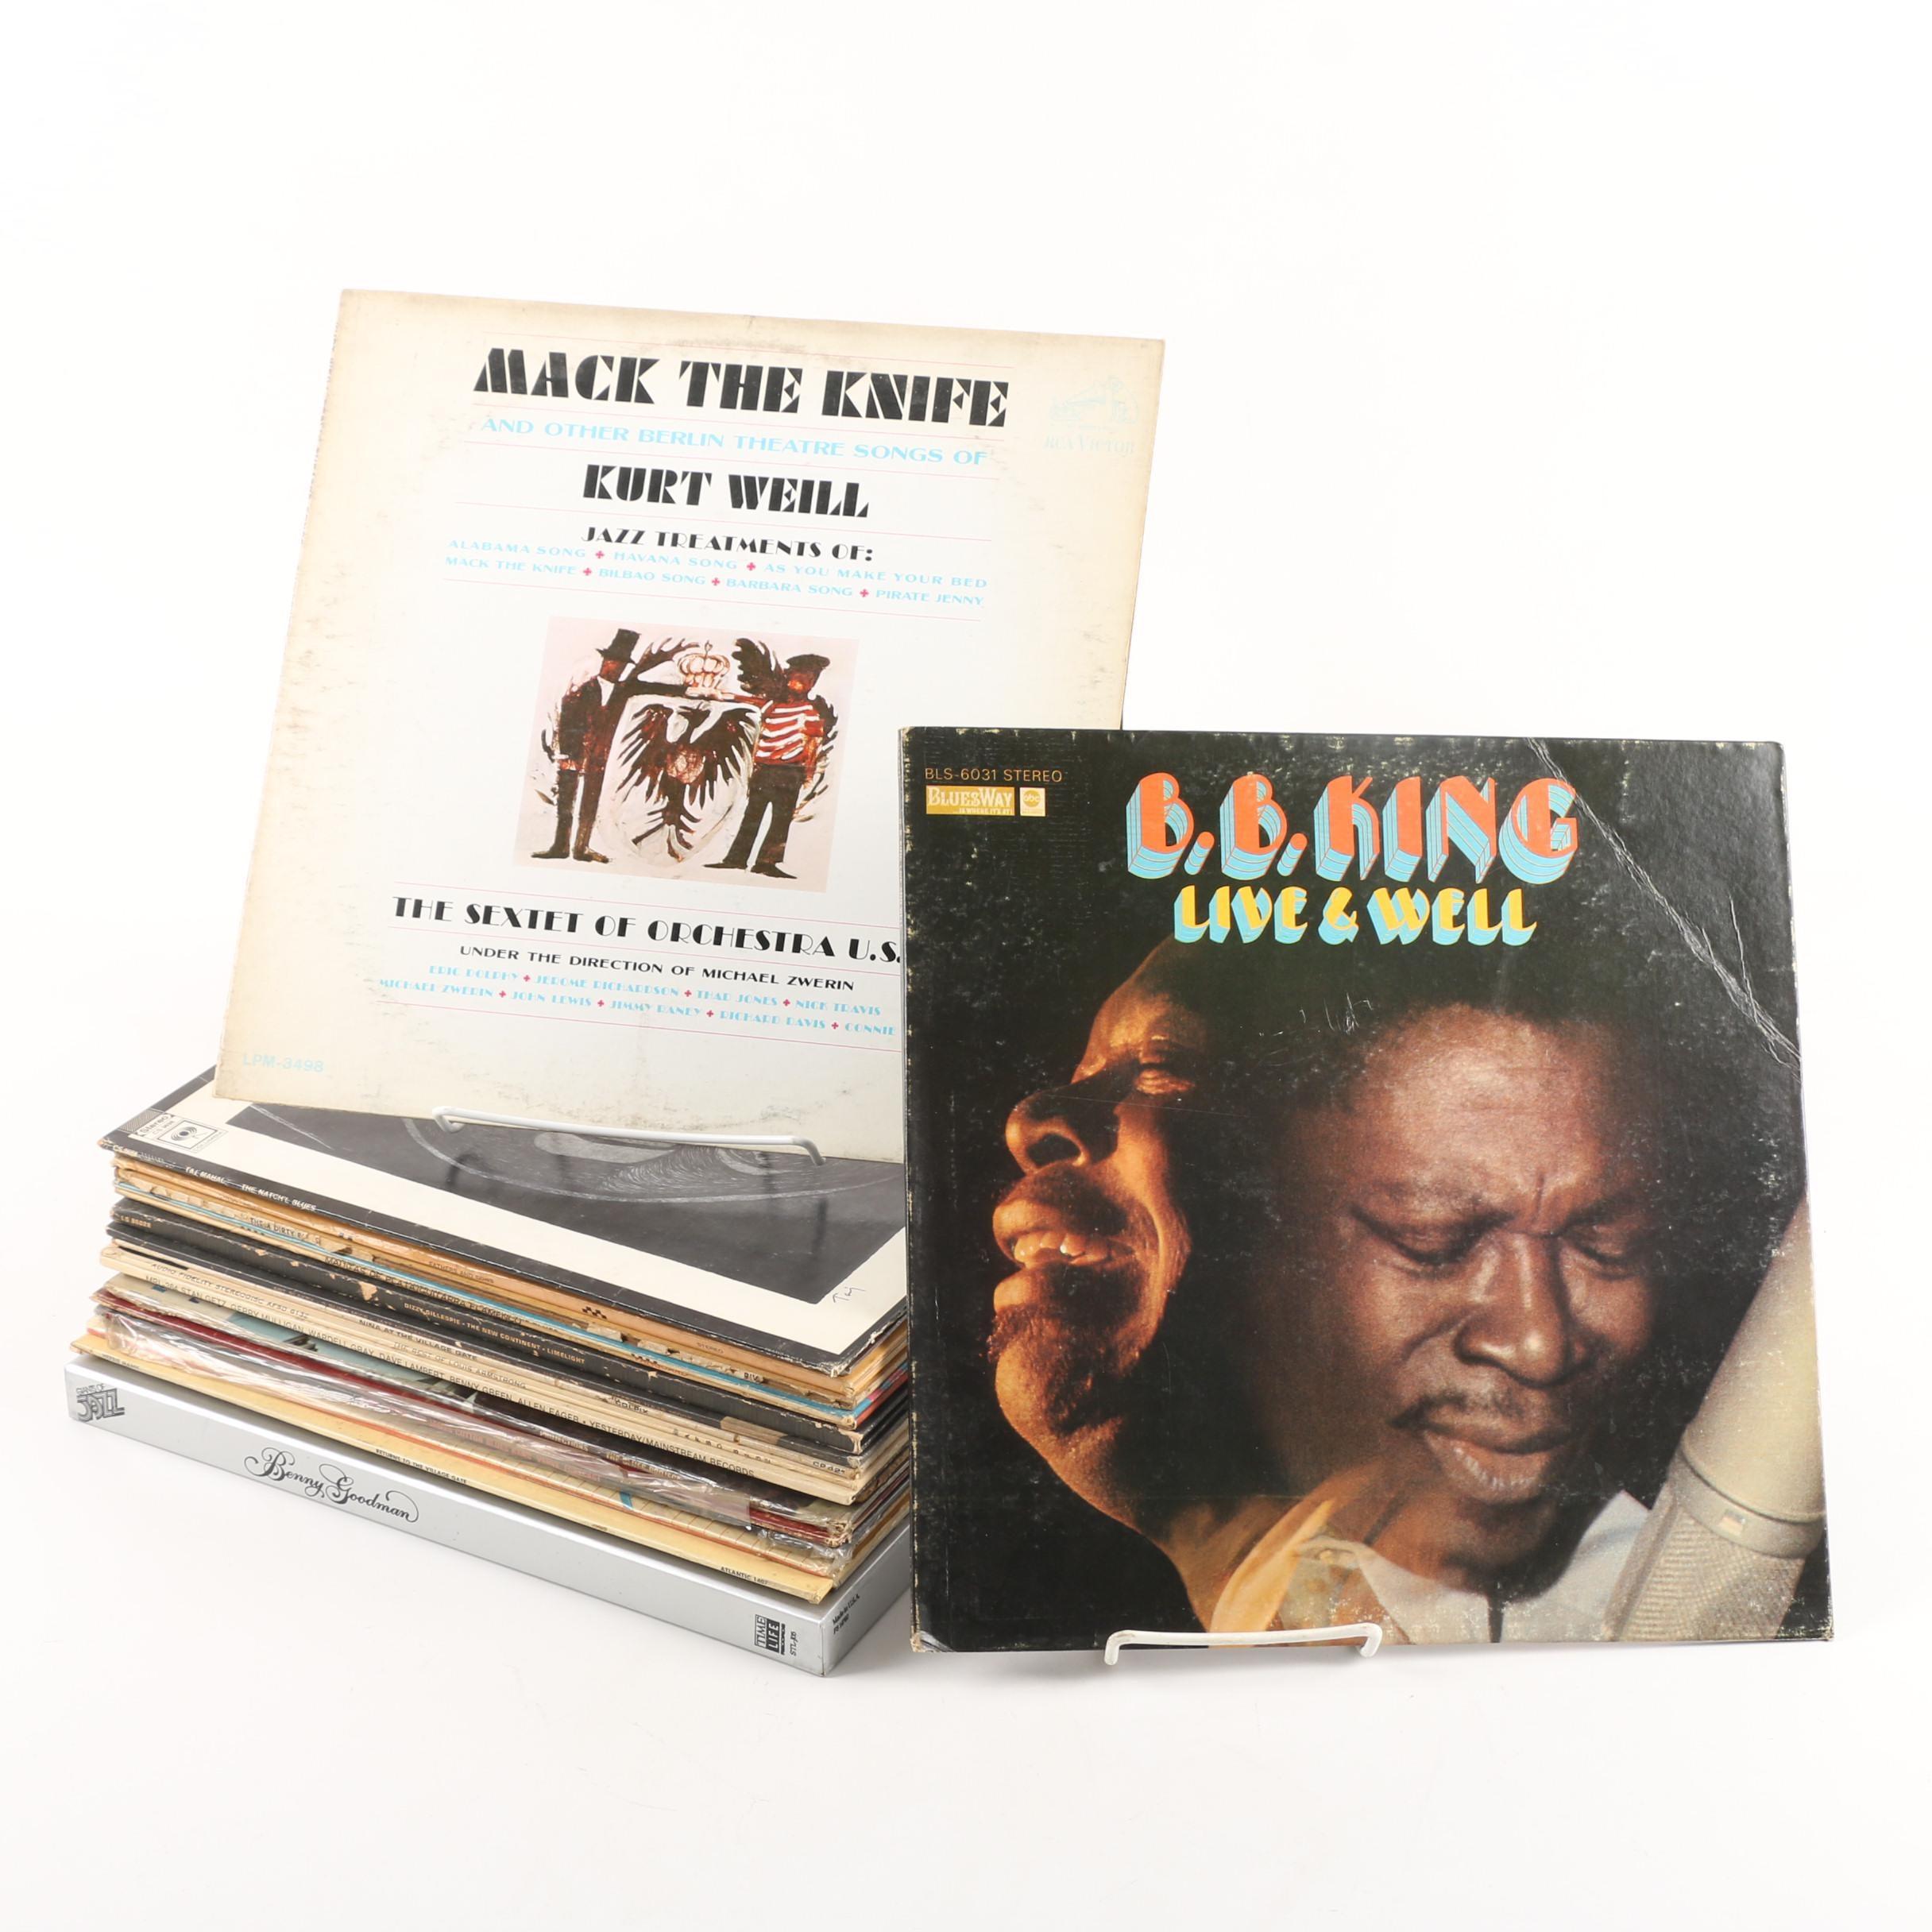 Vintage Jazz and Blues Records including Nina Simone and Art Blakey